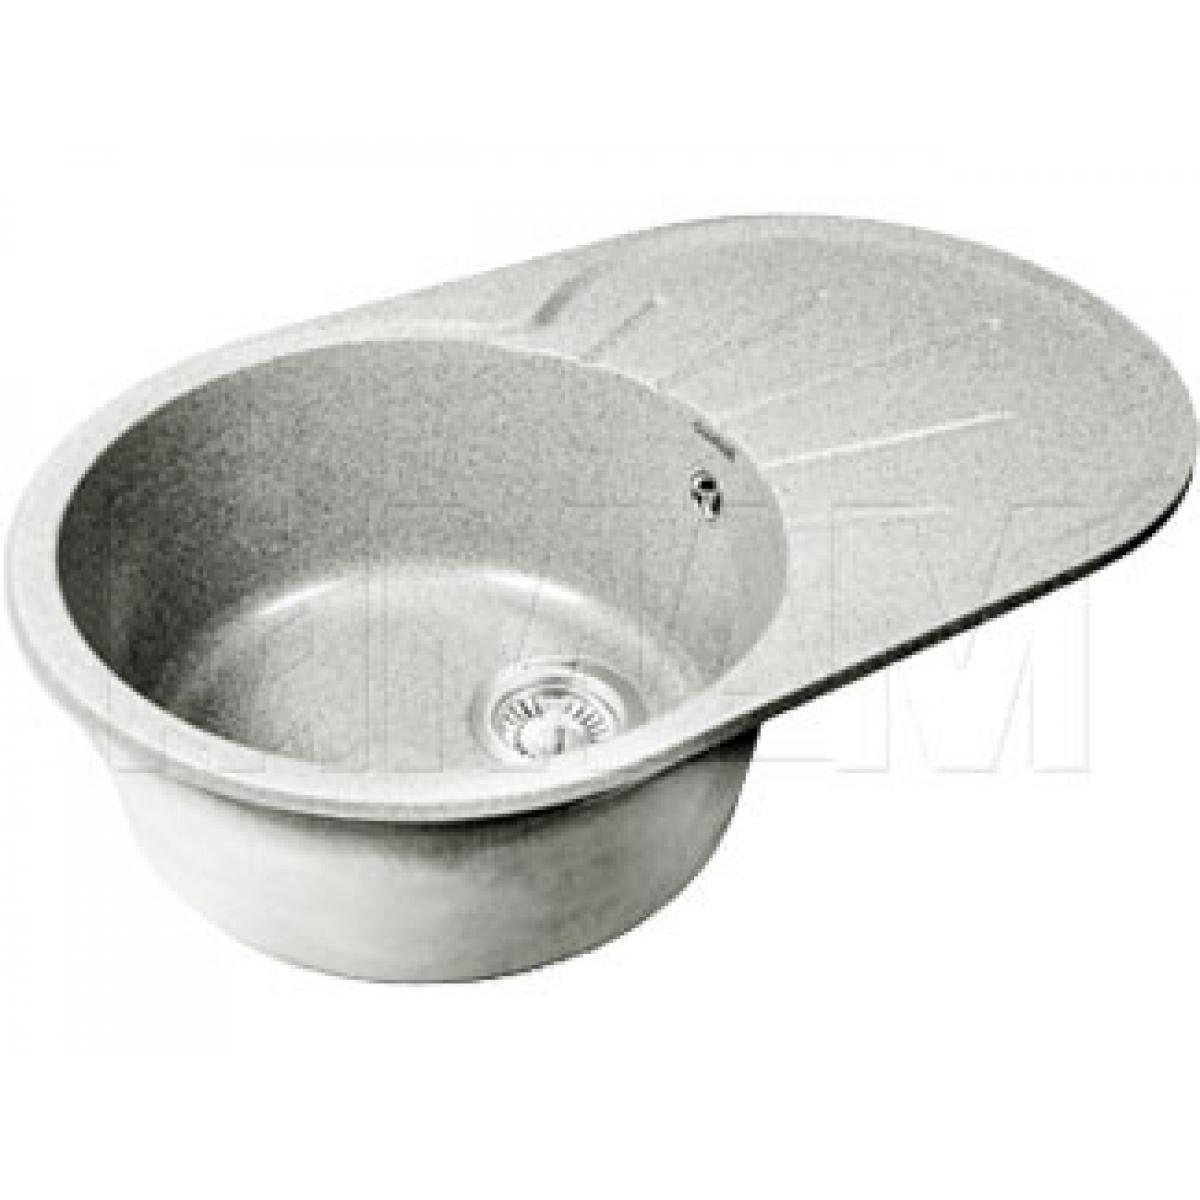 Мойки - RONDO 750L Мойка мрамор, серый, 580х450, B450